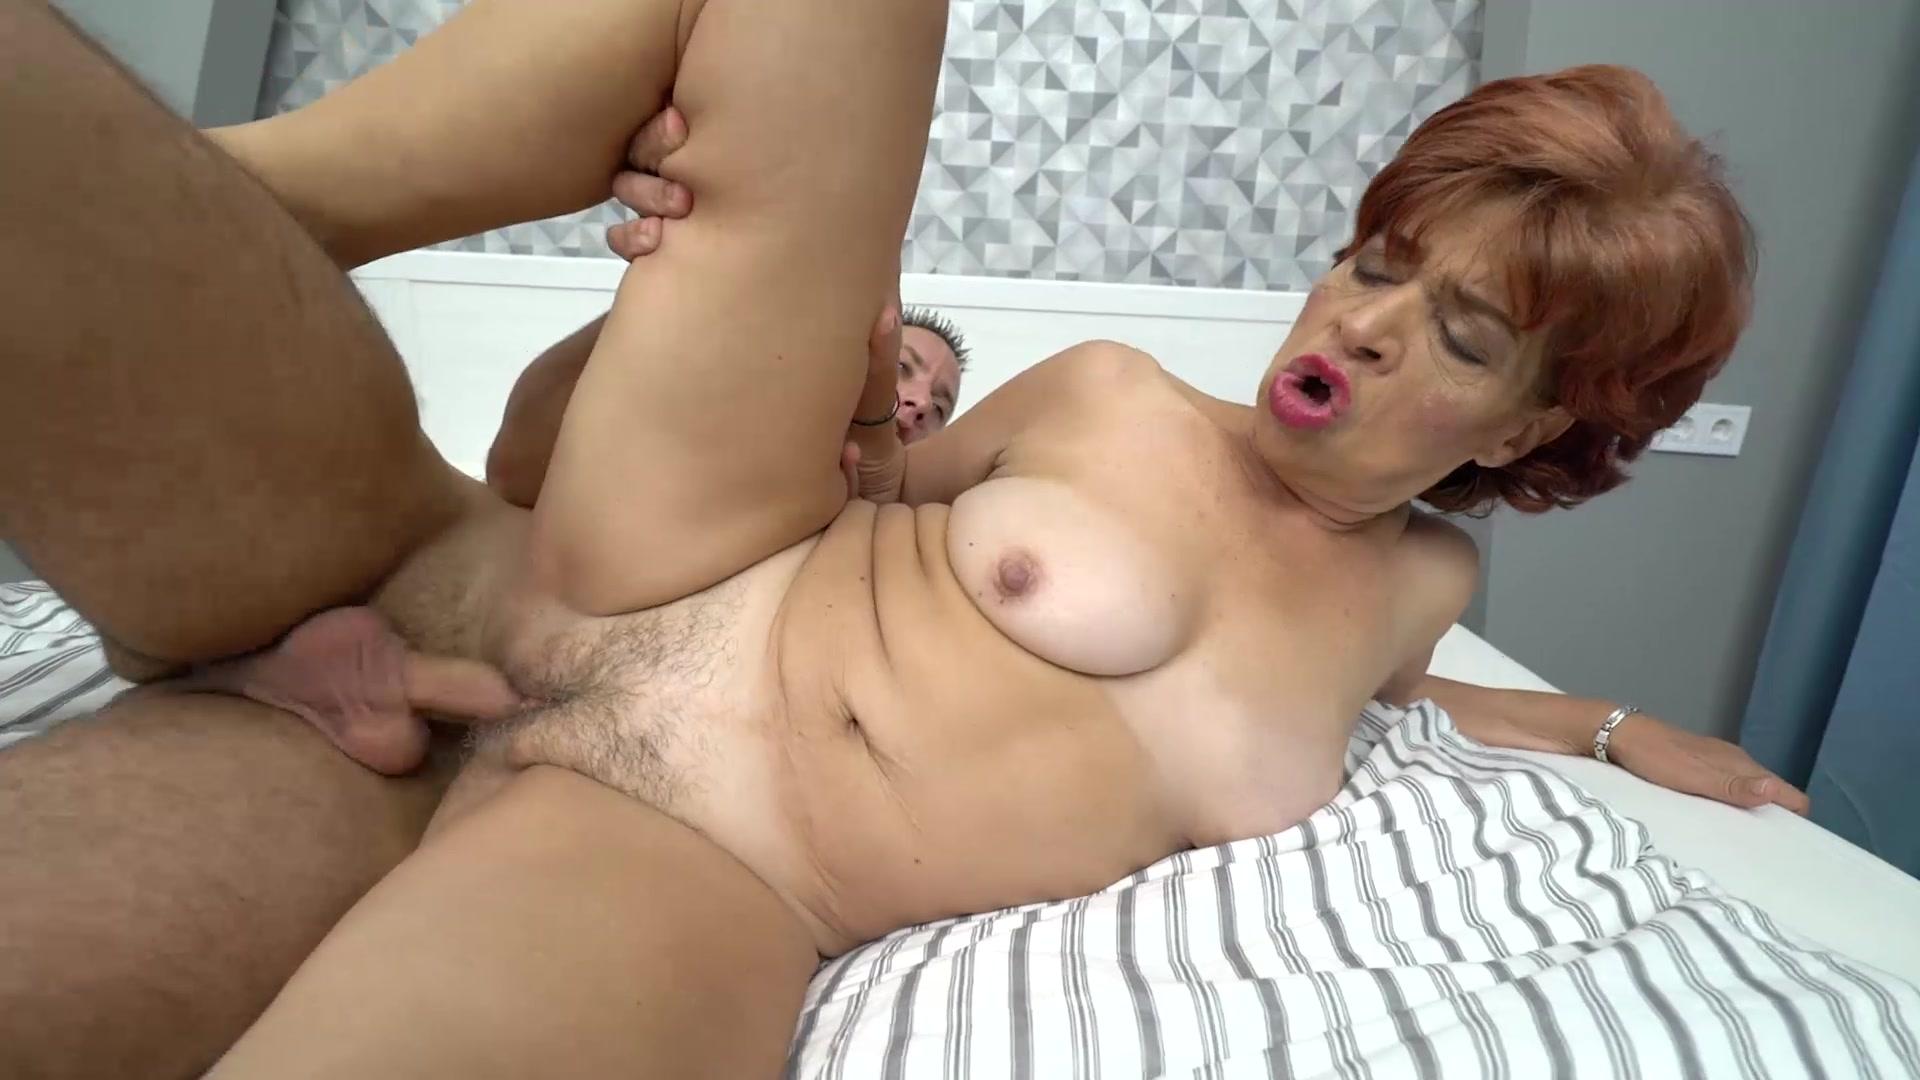 Amateur photo of anal sex